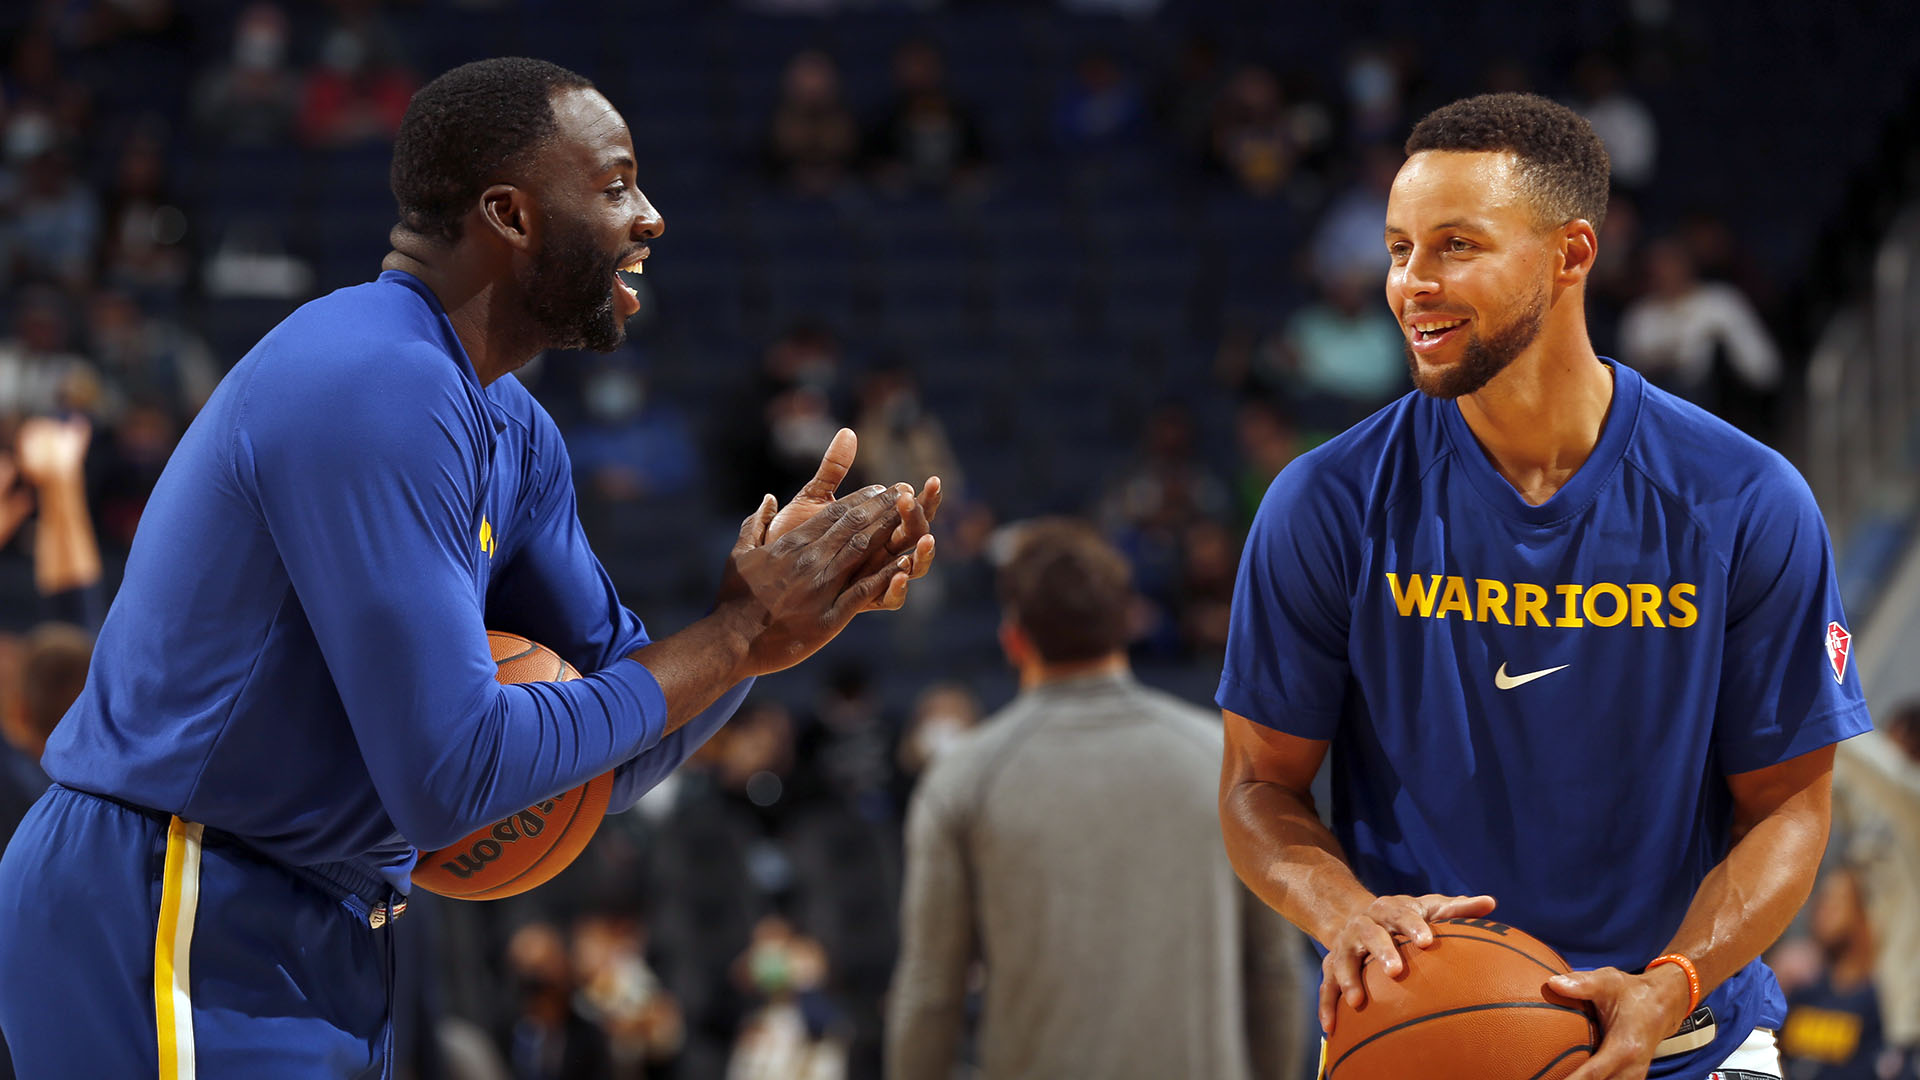 Warriors bringing 'good energy' into new season